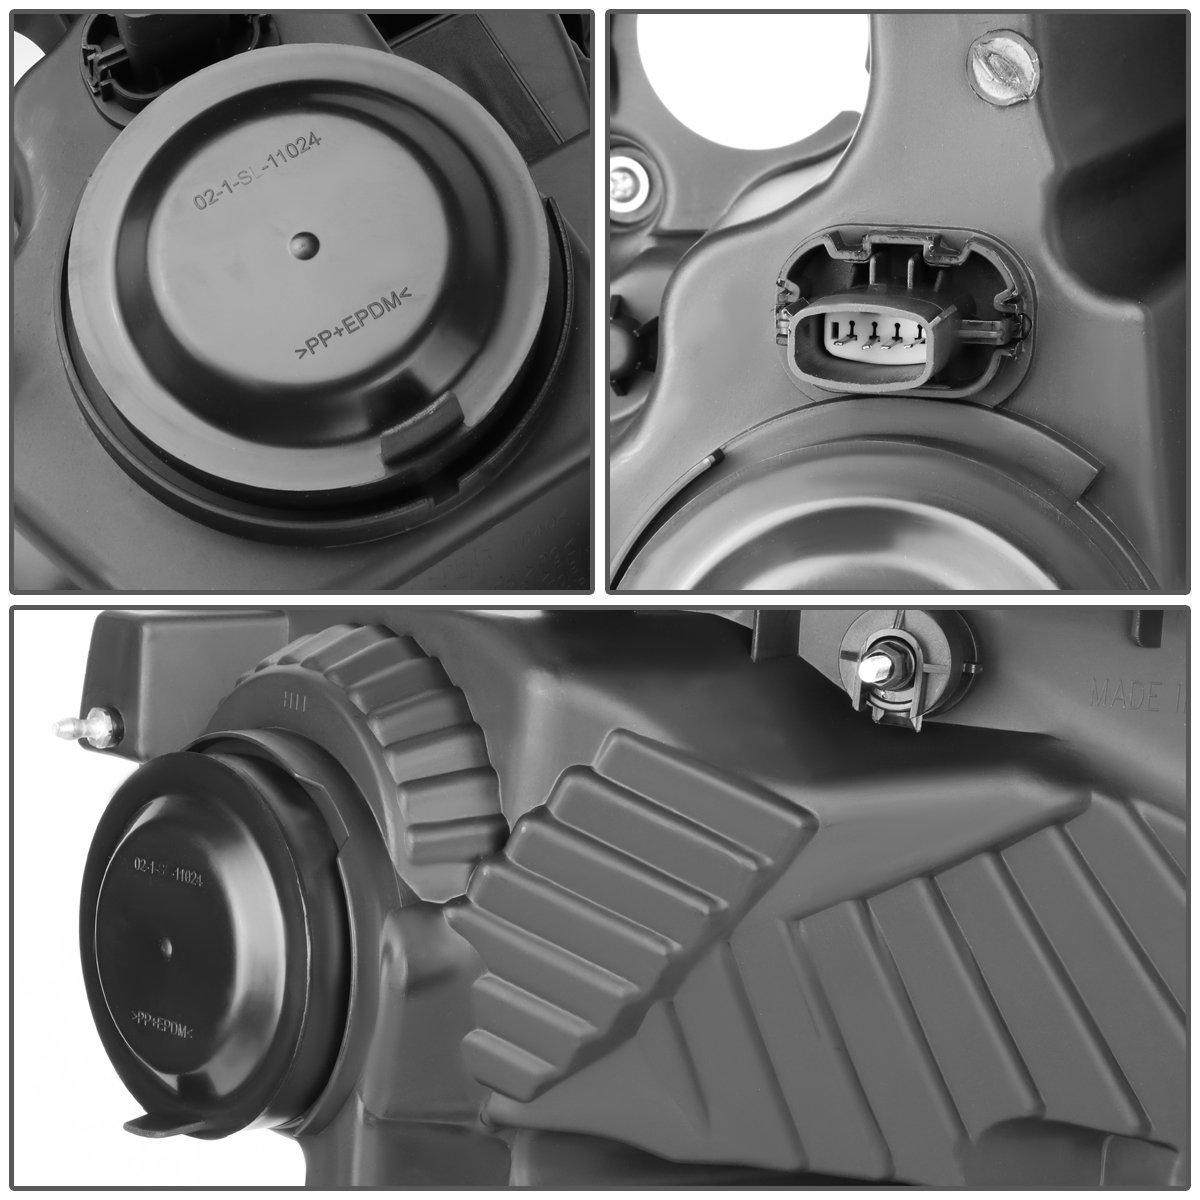 For 15-17 Ford F150 DNA Motoring HL-LB-F15015-CH-AM 3D LED Running DRL Headlight Chrome//Amber